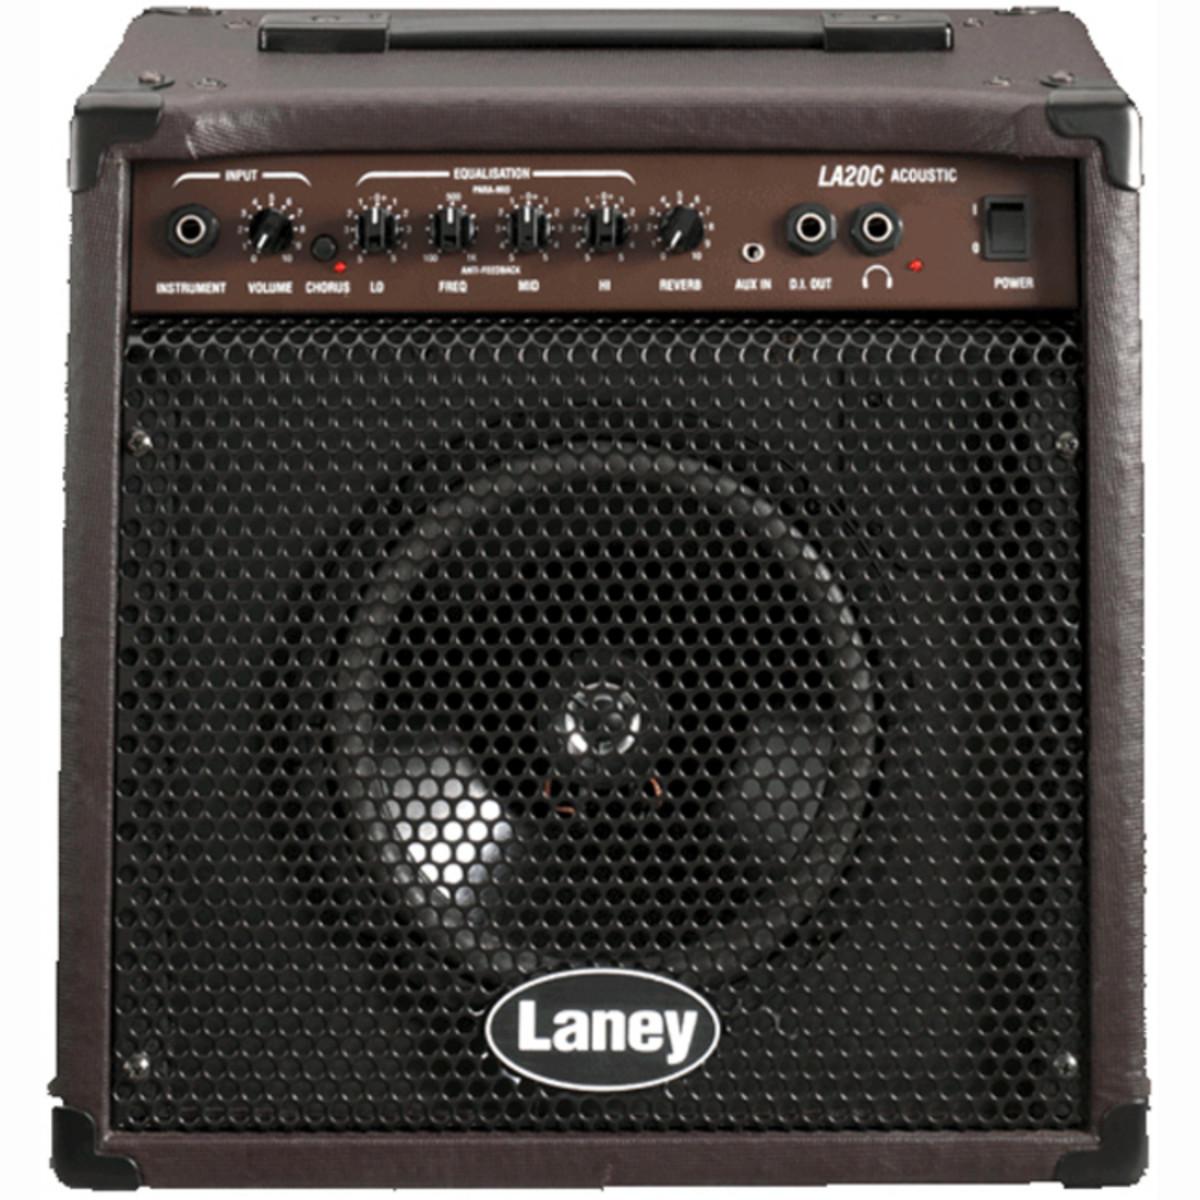 laney la20c acoustic guitar combo amplifier at gear4music. Black Bedroom Furniture Sets. Home Design Ideas